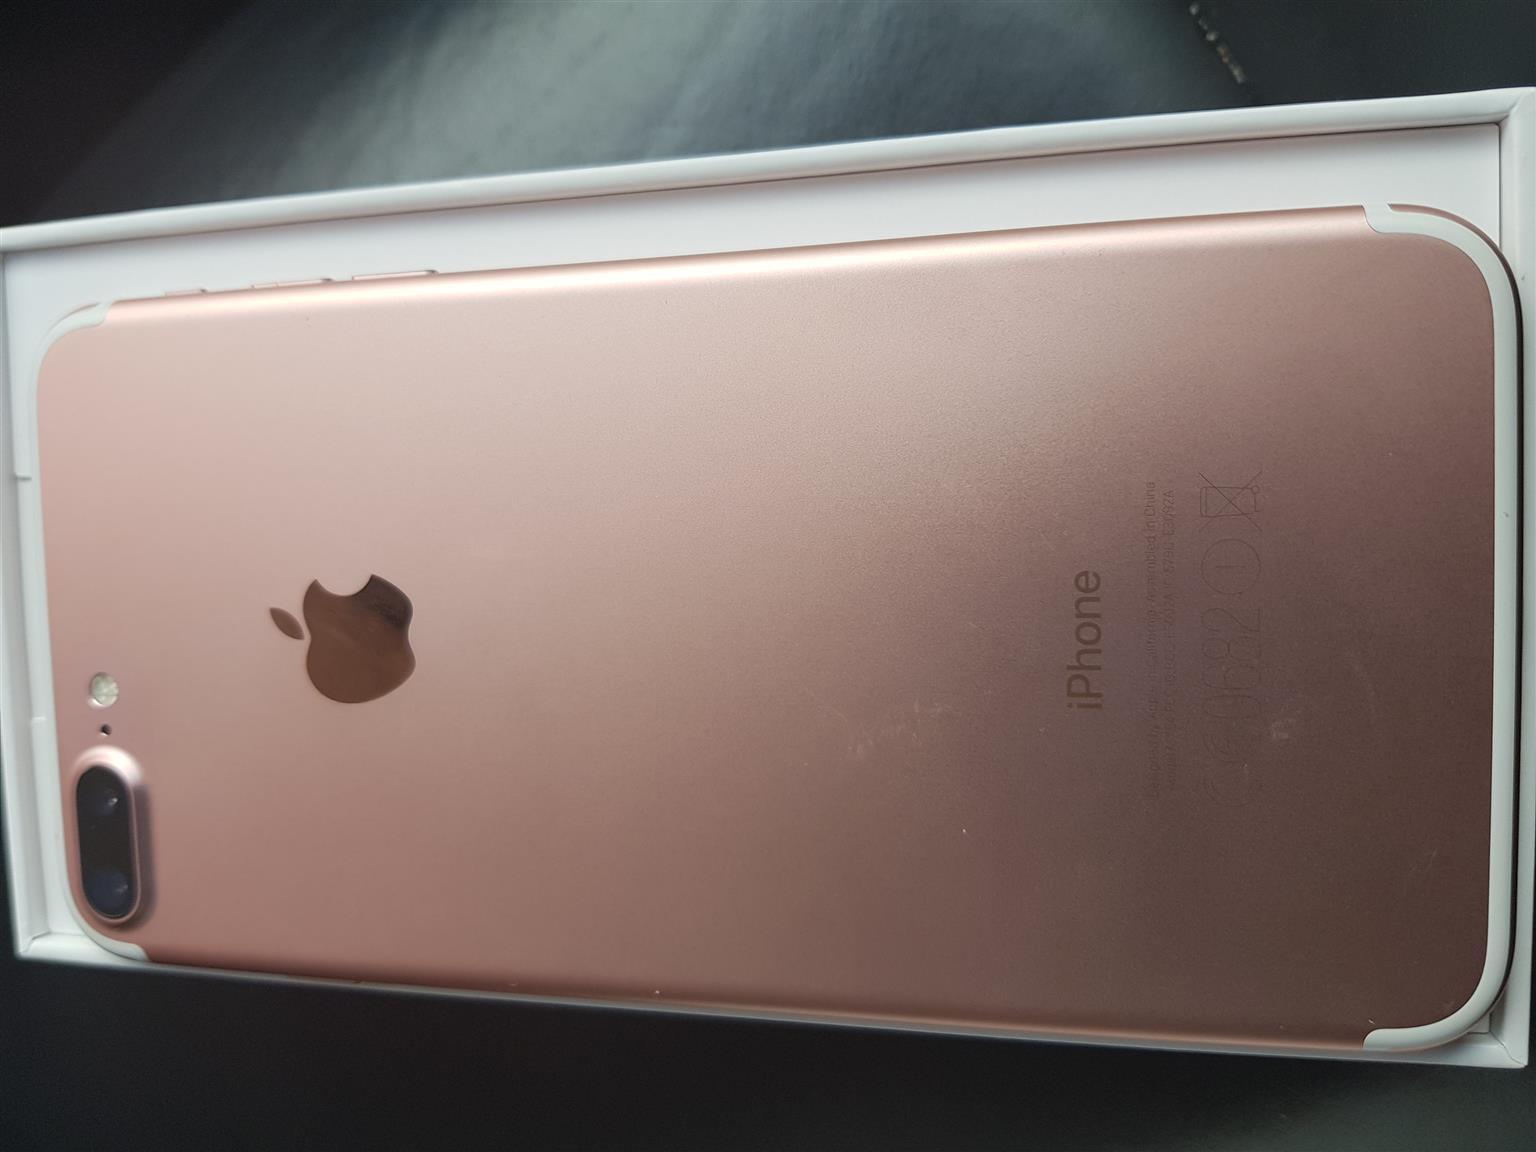 Iphone 7 Plus Rose Gold 32gb Junk Mail 32 Gb